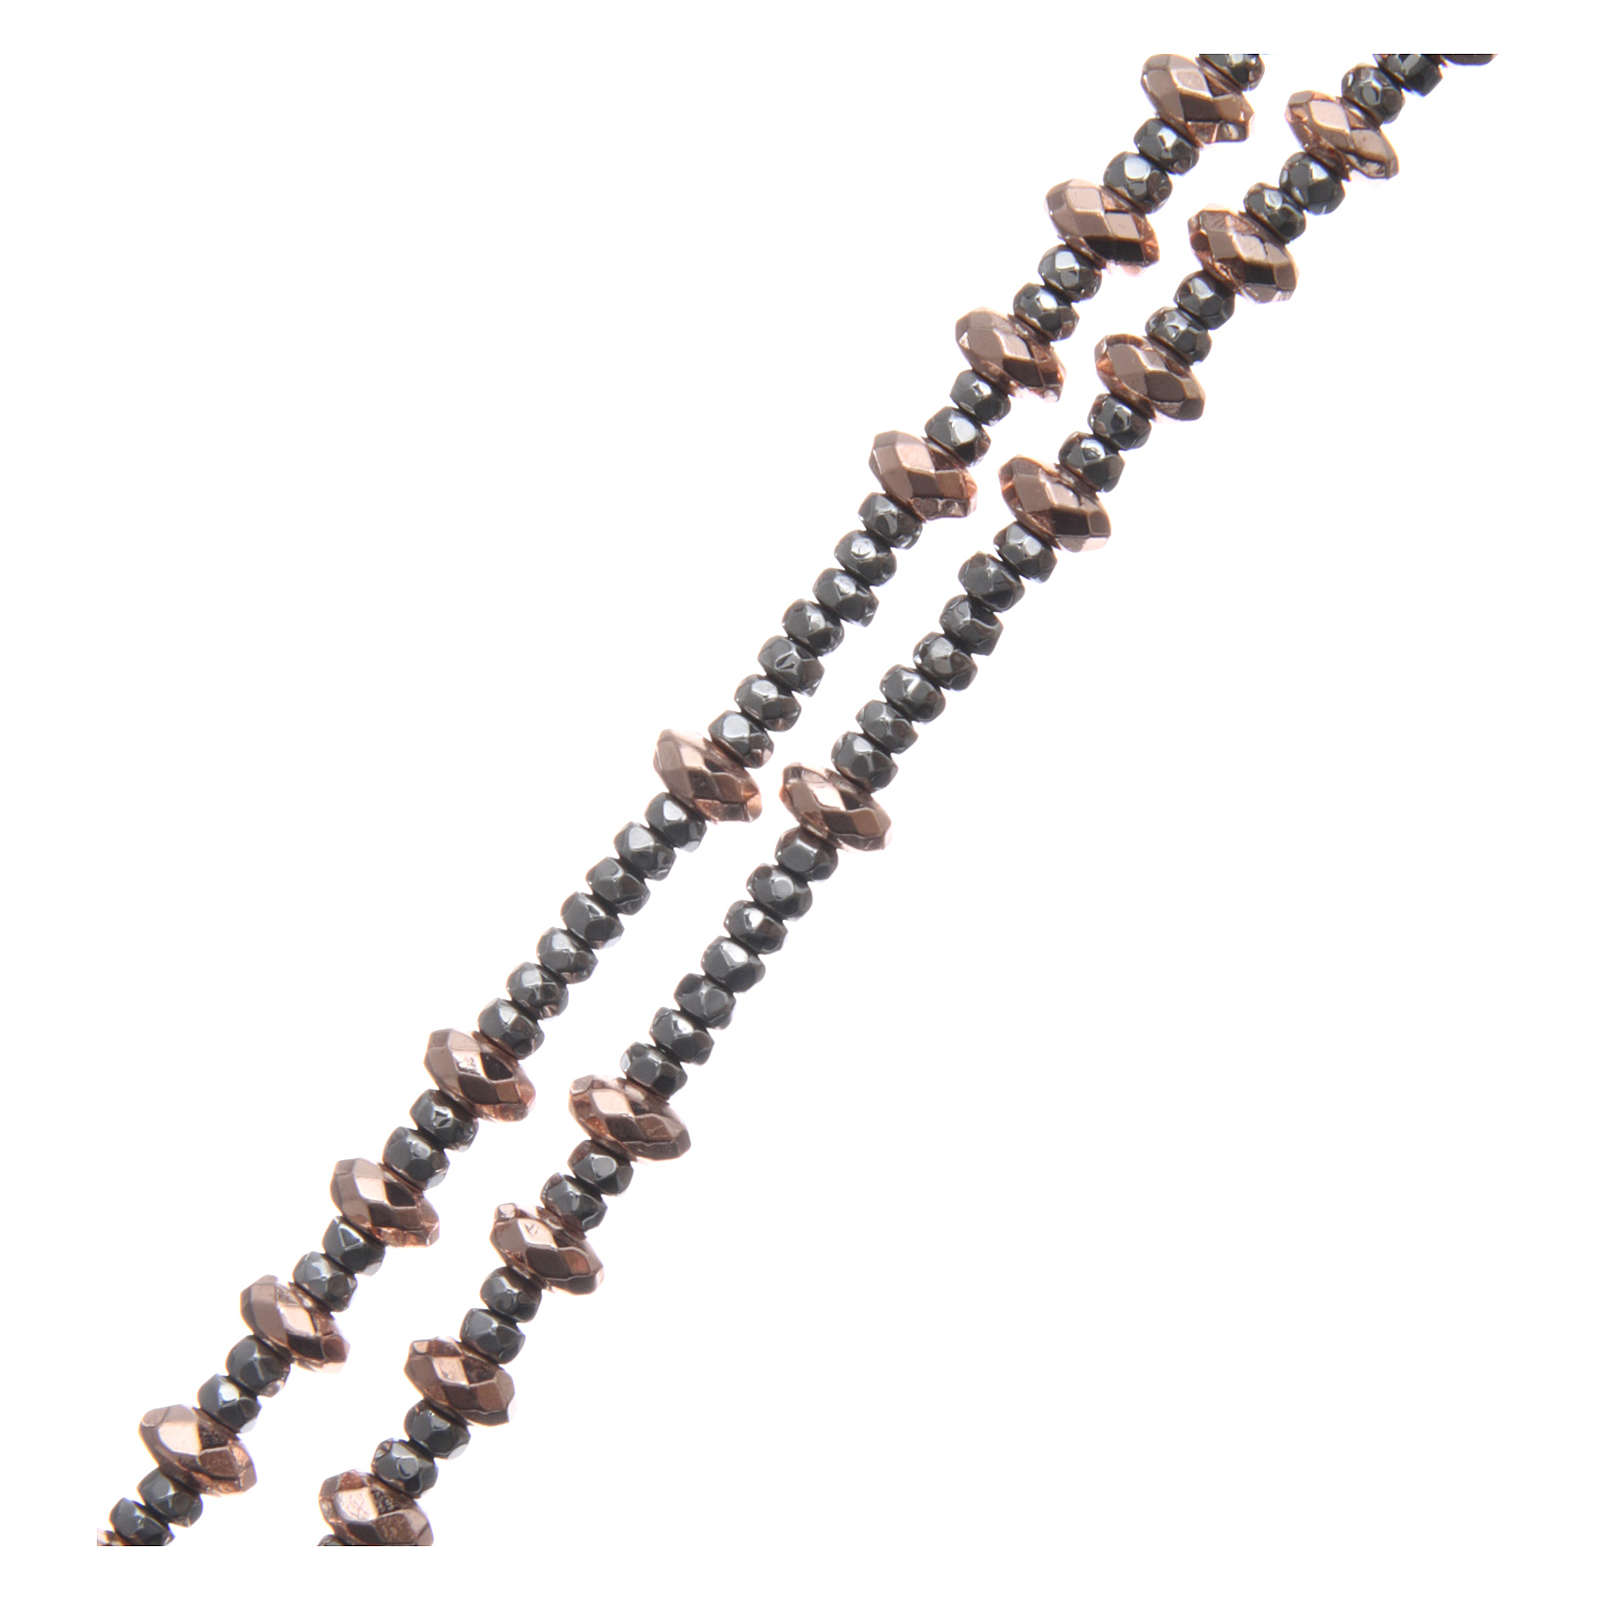 Rosario plata 925 cable bolitas arandelas hematites rosada tallada 4